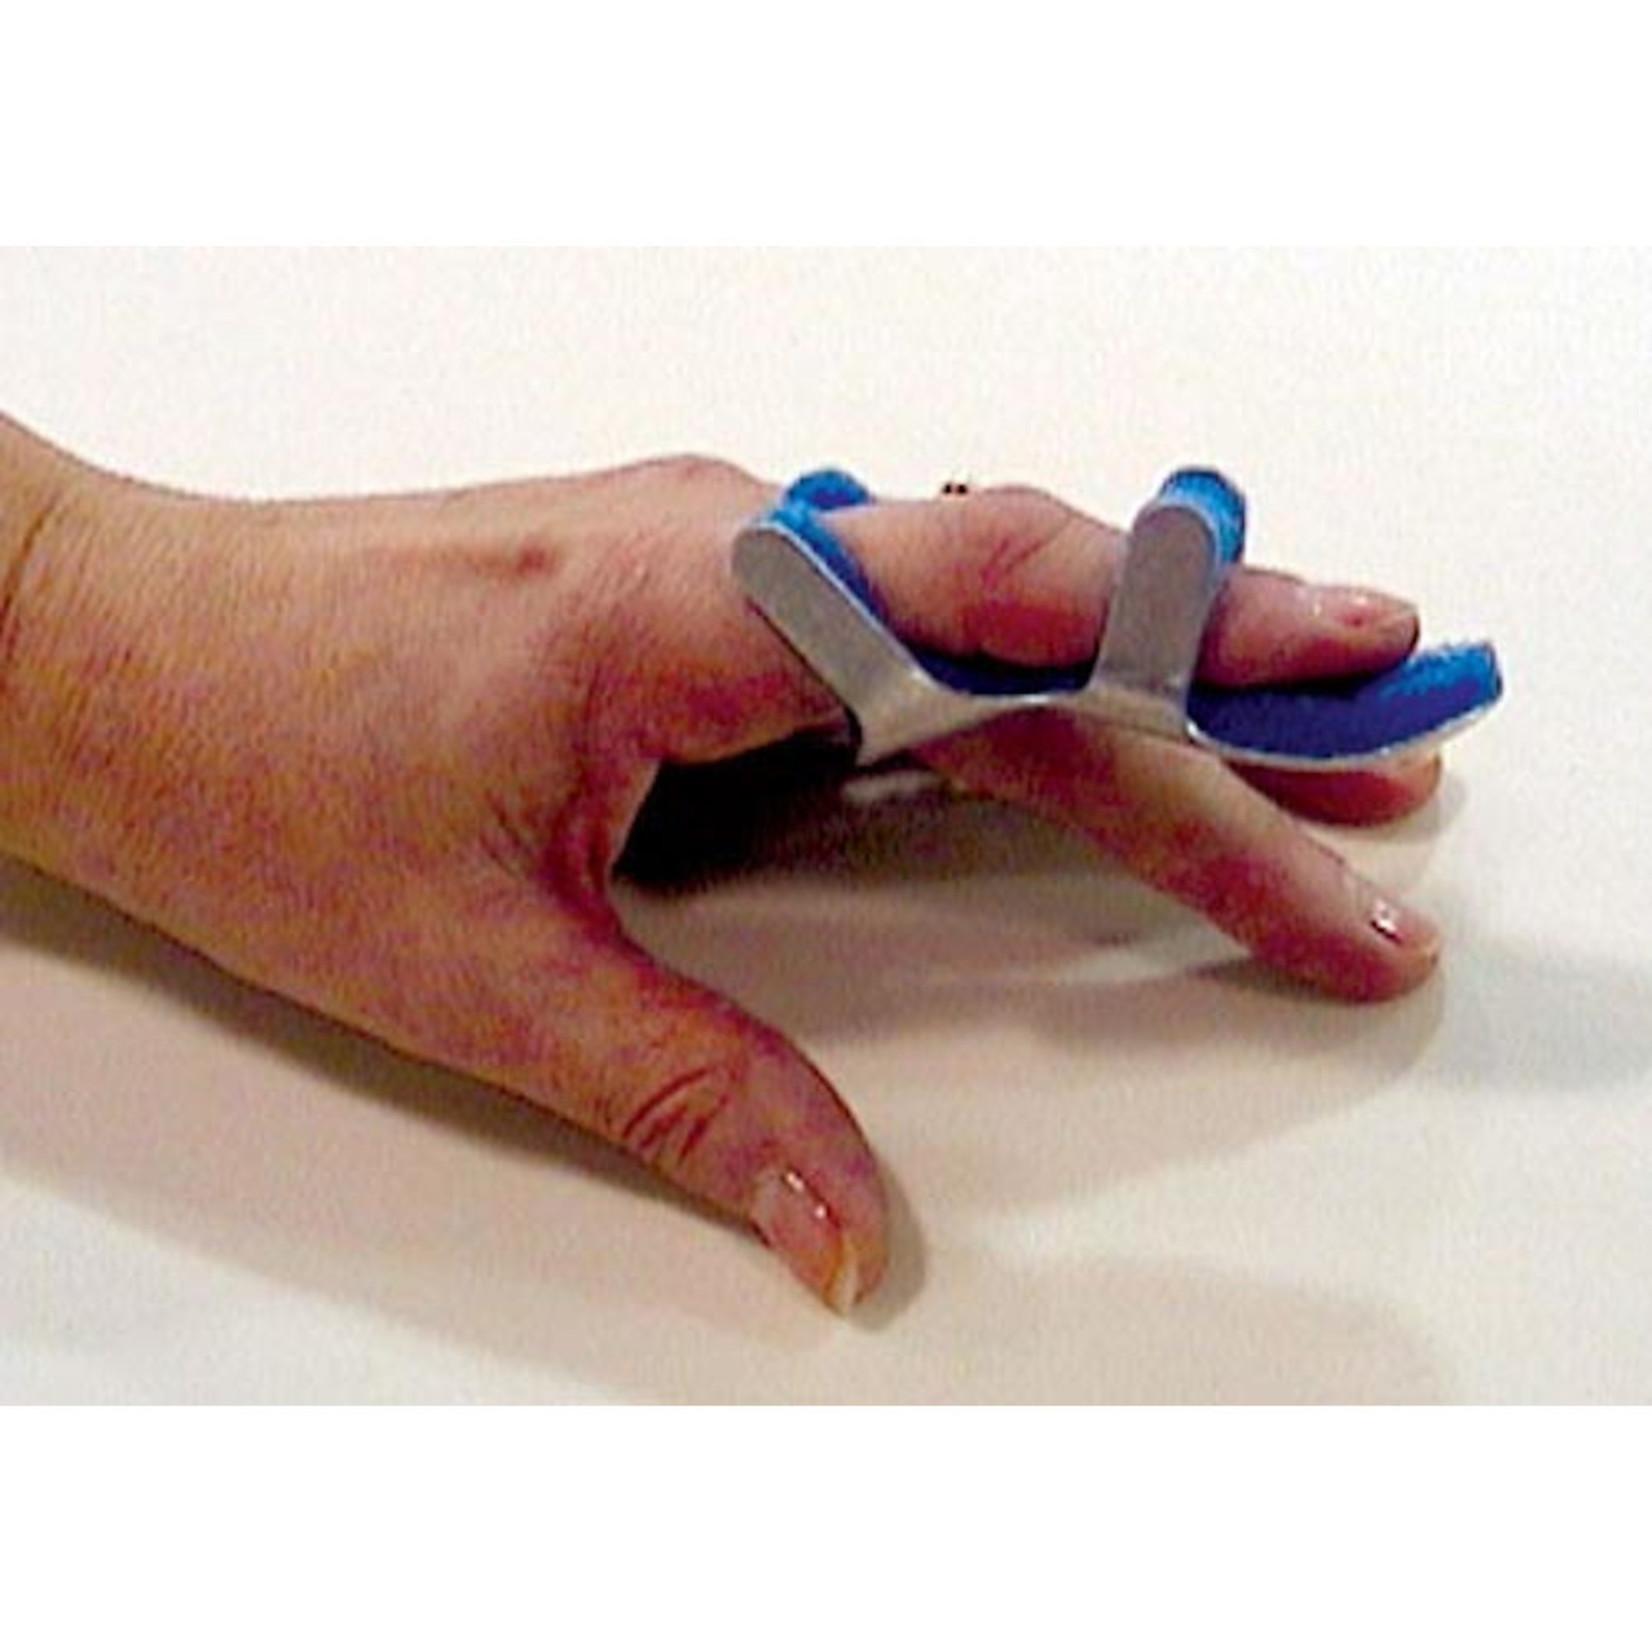 Apothecary Products Finger Splint -Medium